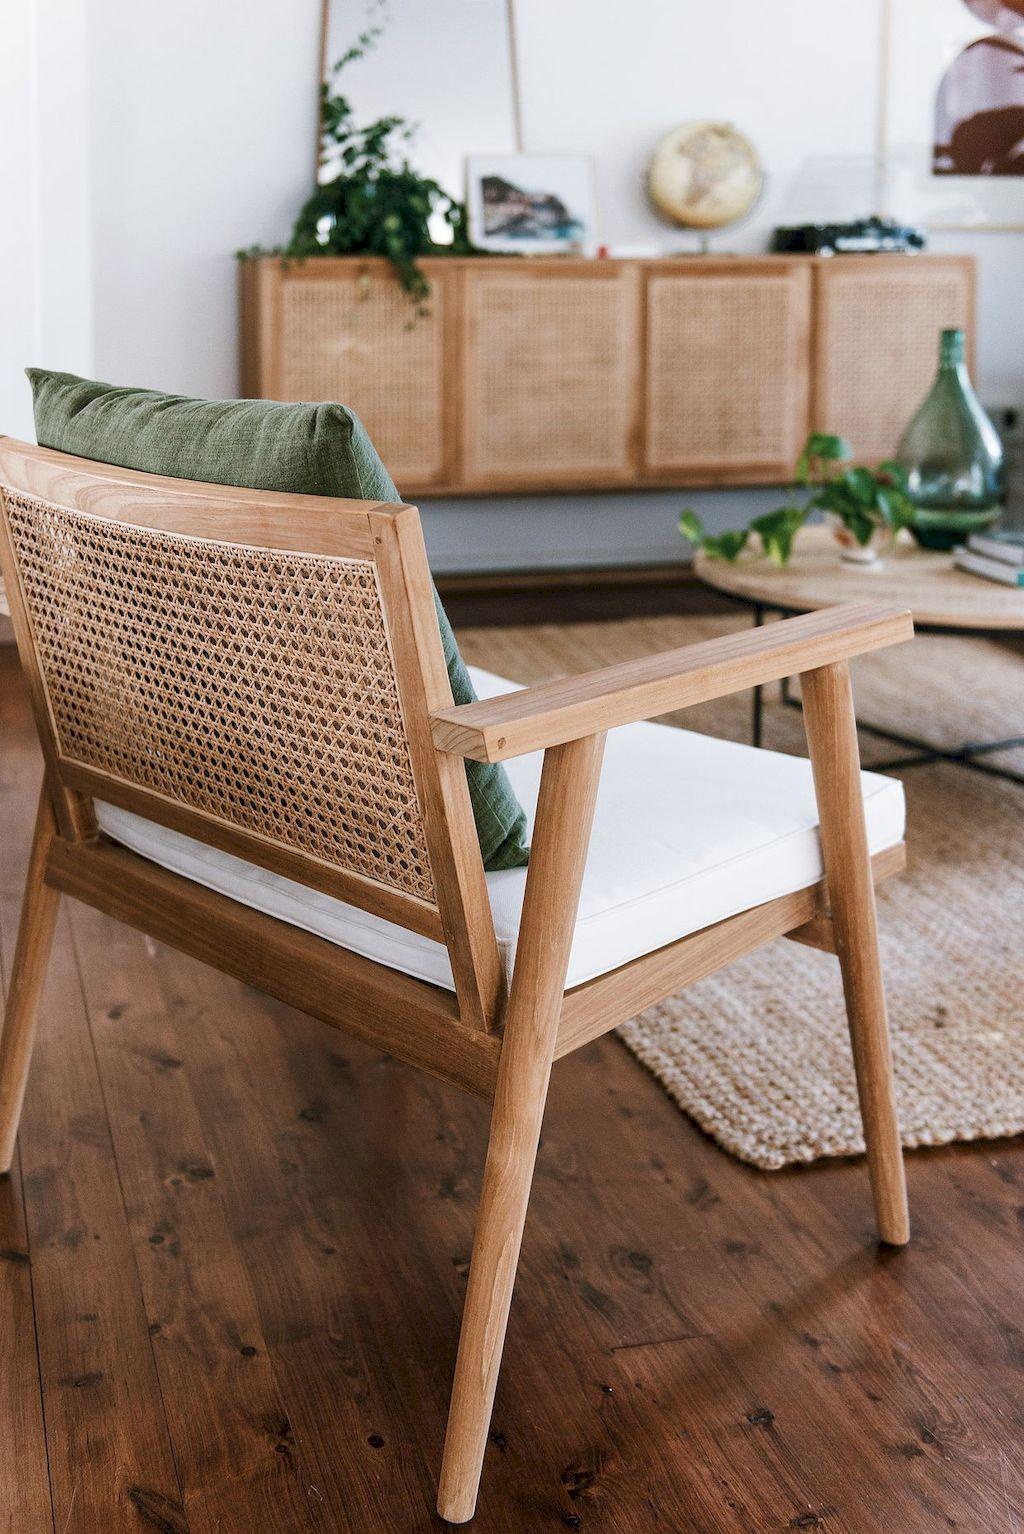 Wooden Furniture022